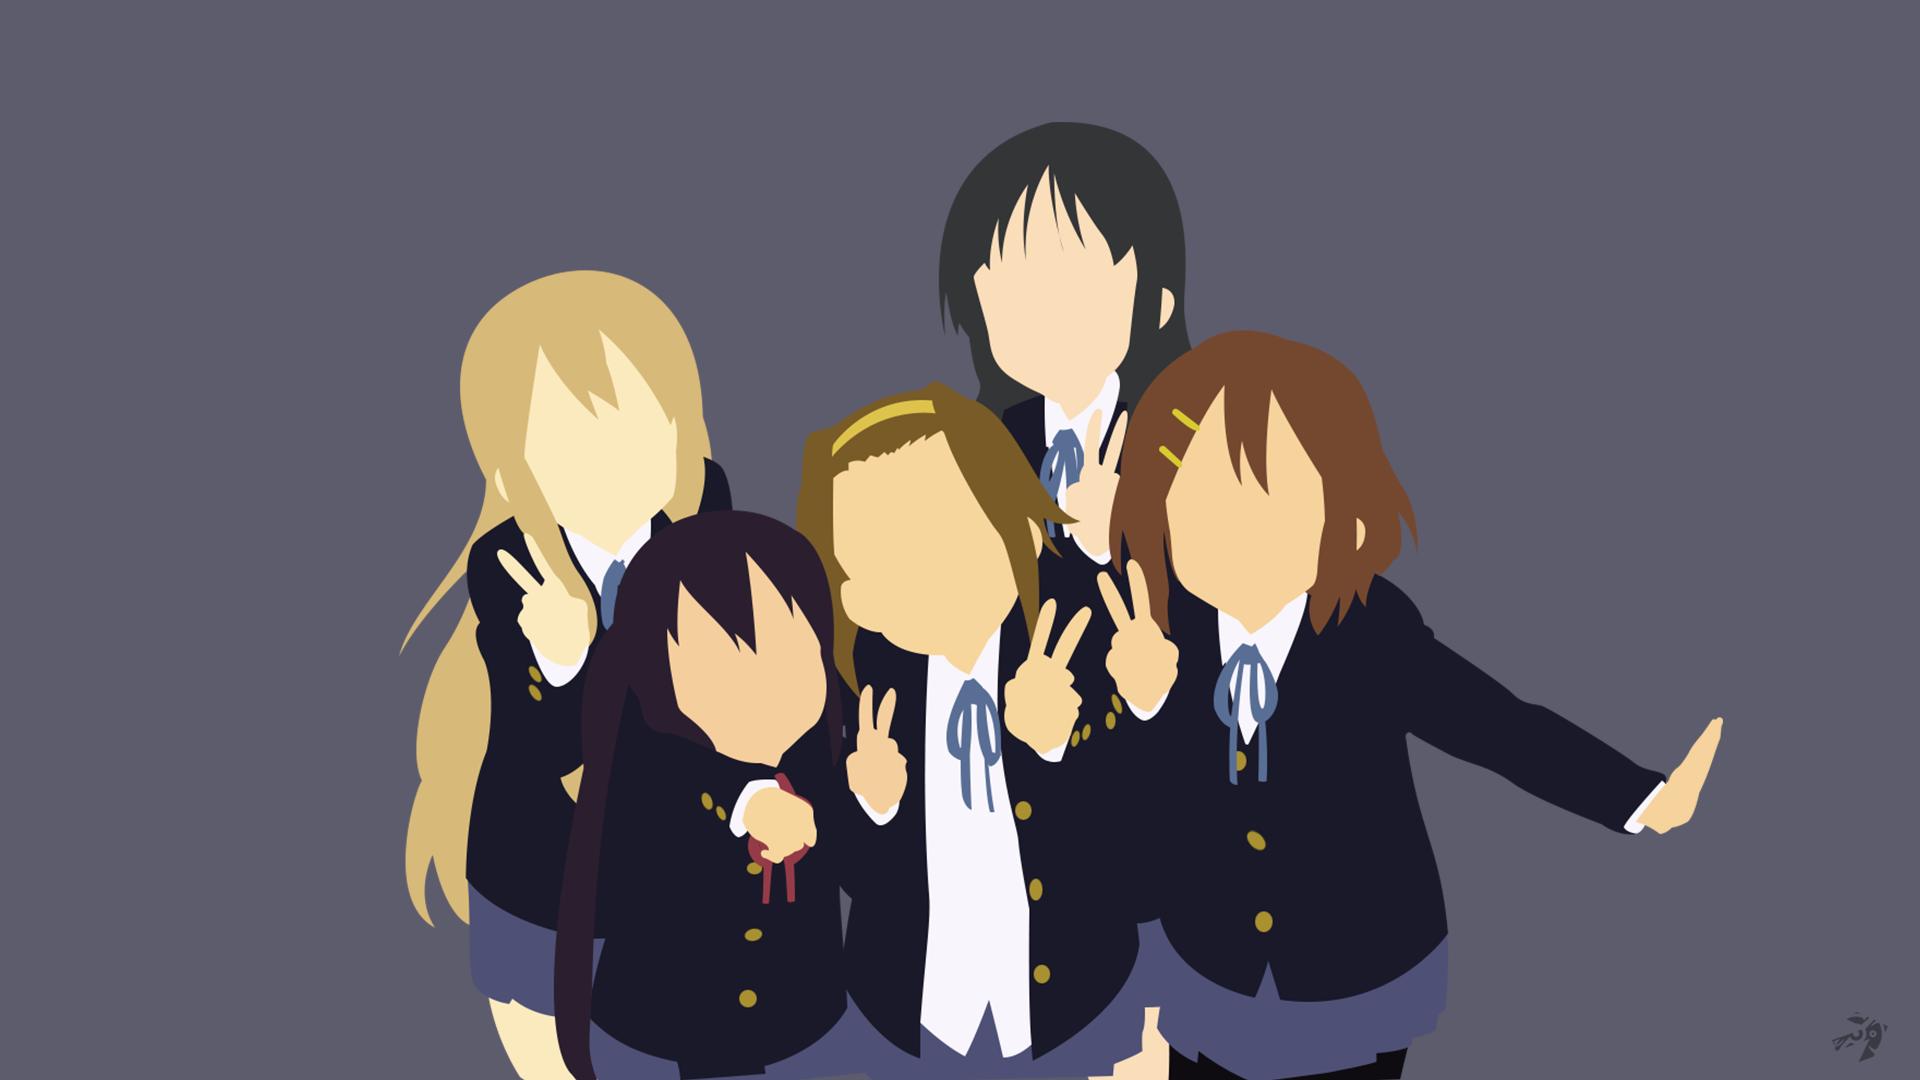 K-ON Minimalist Anime Wallpaper by Lucifer012 on DeviantArt